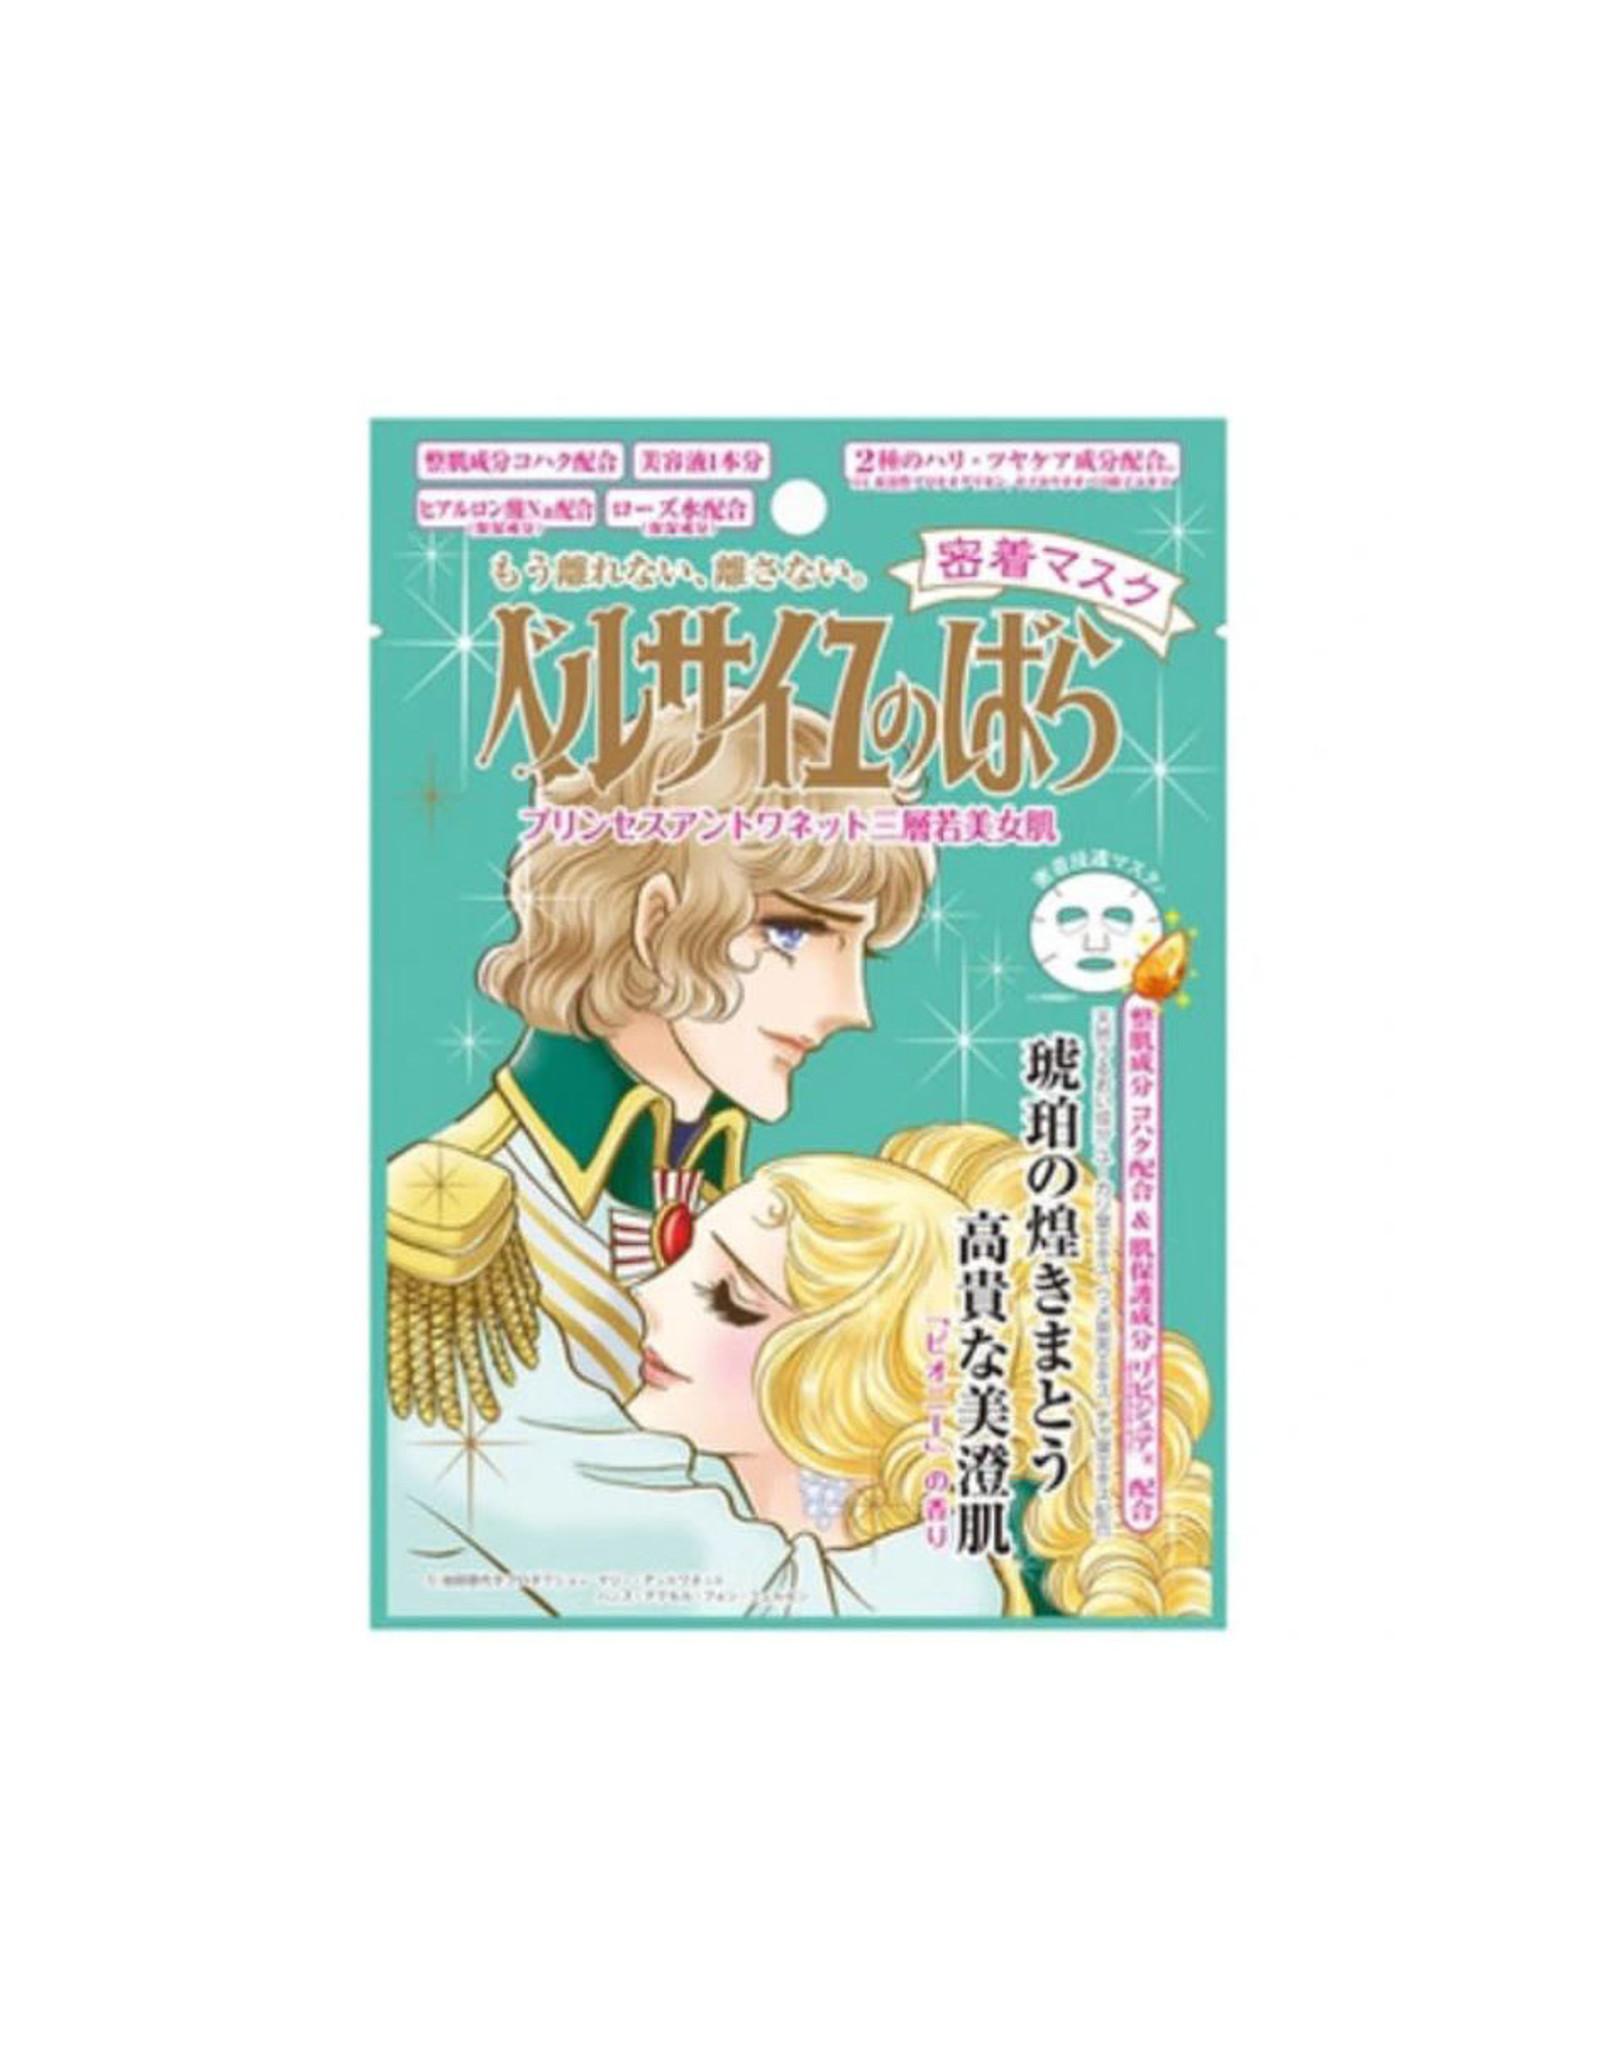 Bandai Bandai The Rose of Versailles Facial Mask Princess Antoinette Face Mask Peony